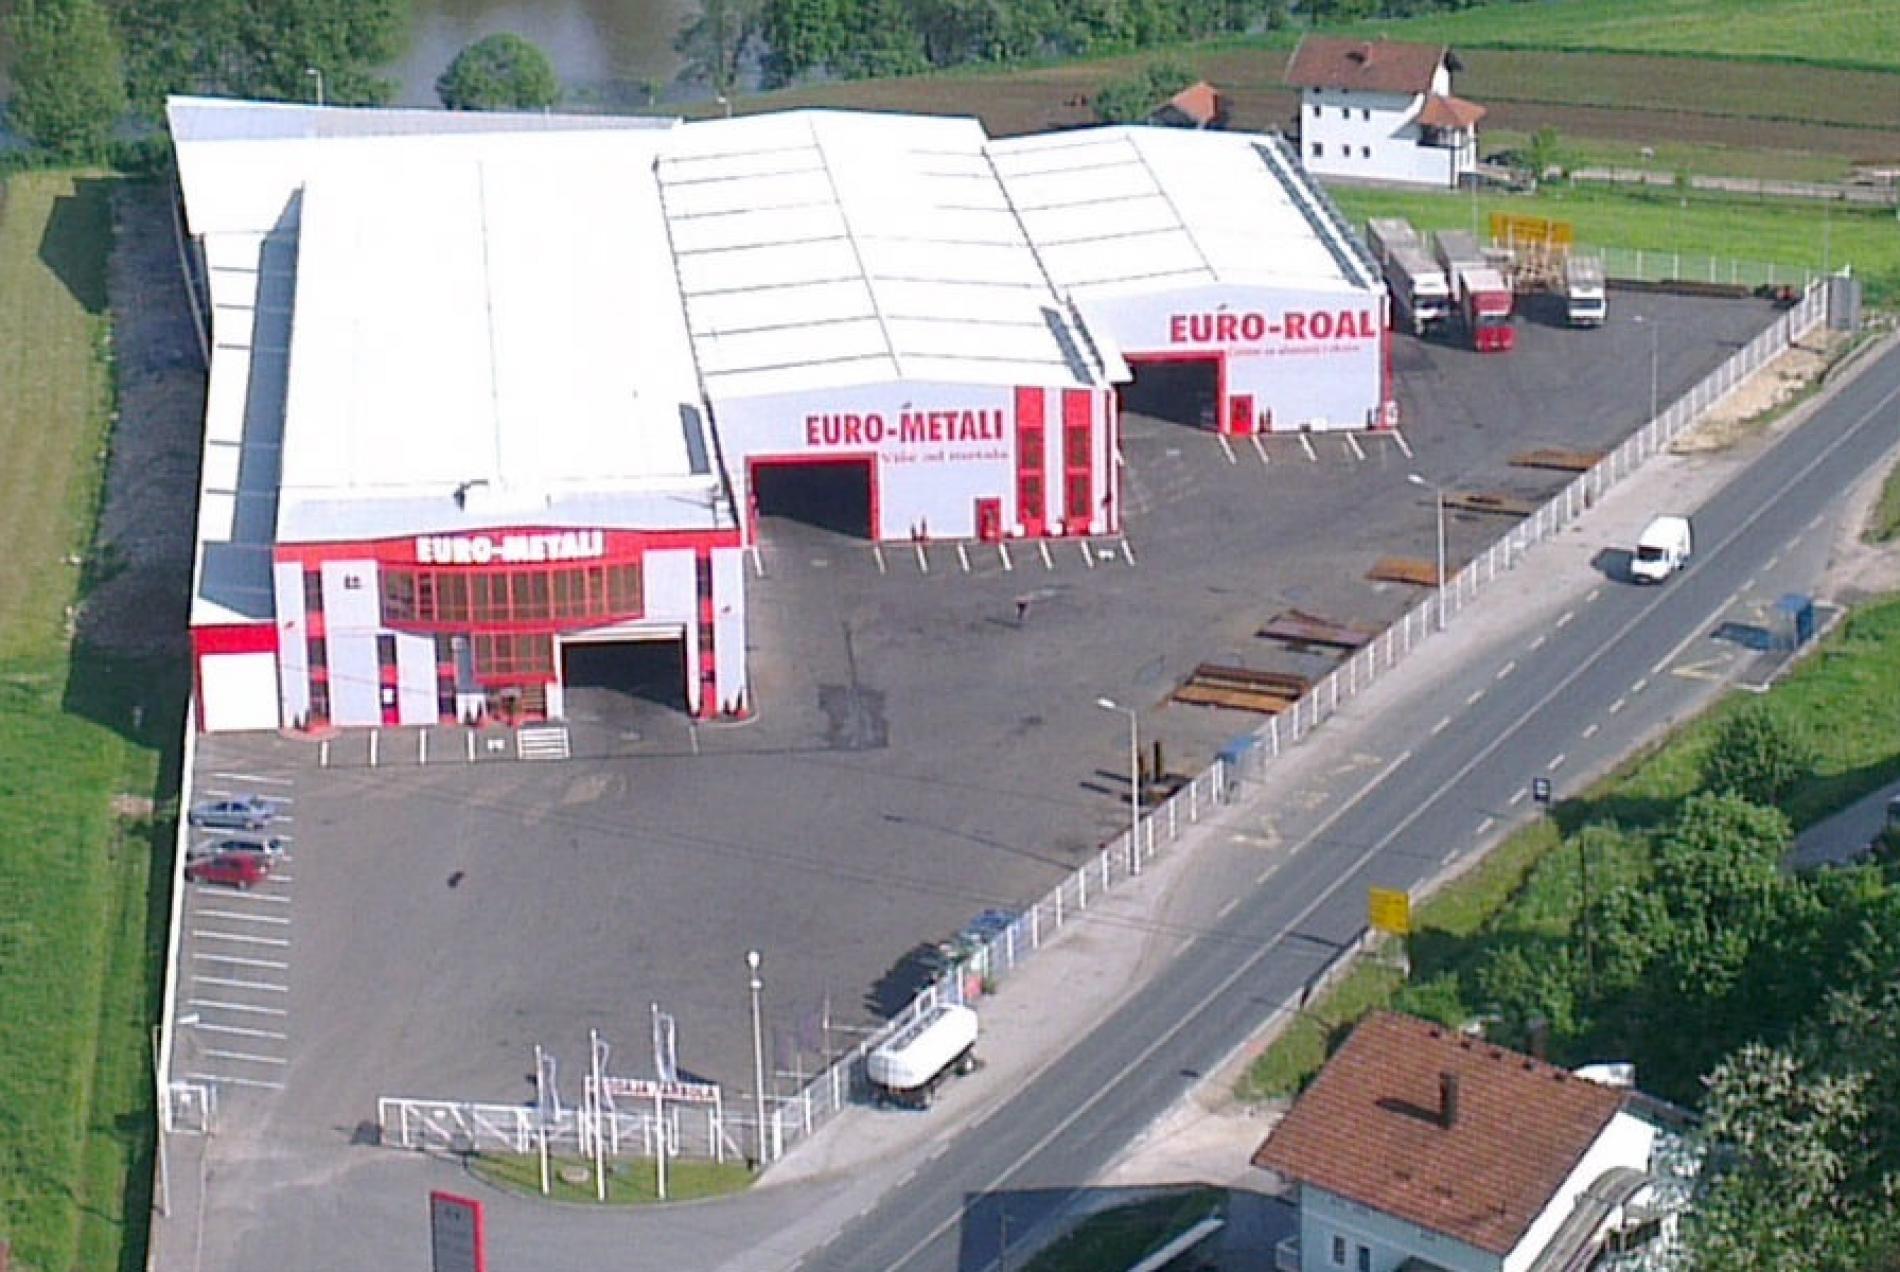 Euro-Metali kupili Mersteel, nekadašnjeg slovenskog giganta u Bosni i Hercegovini